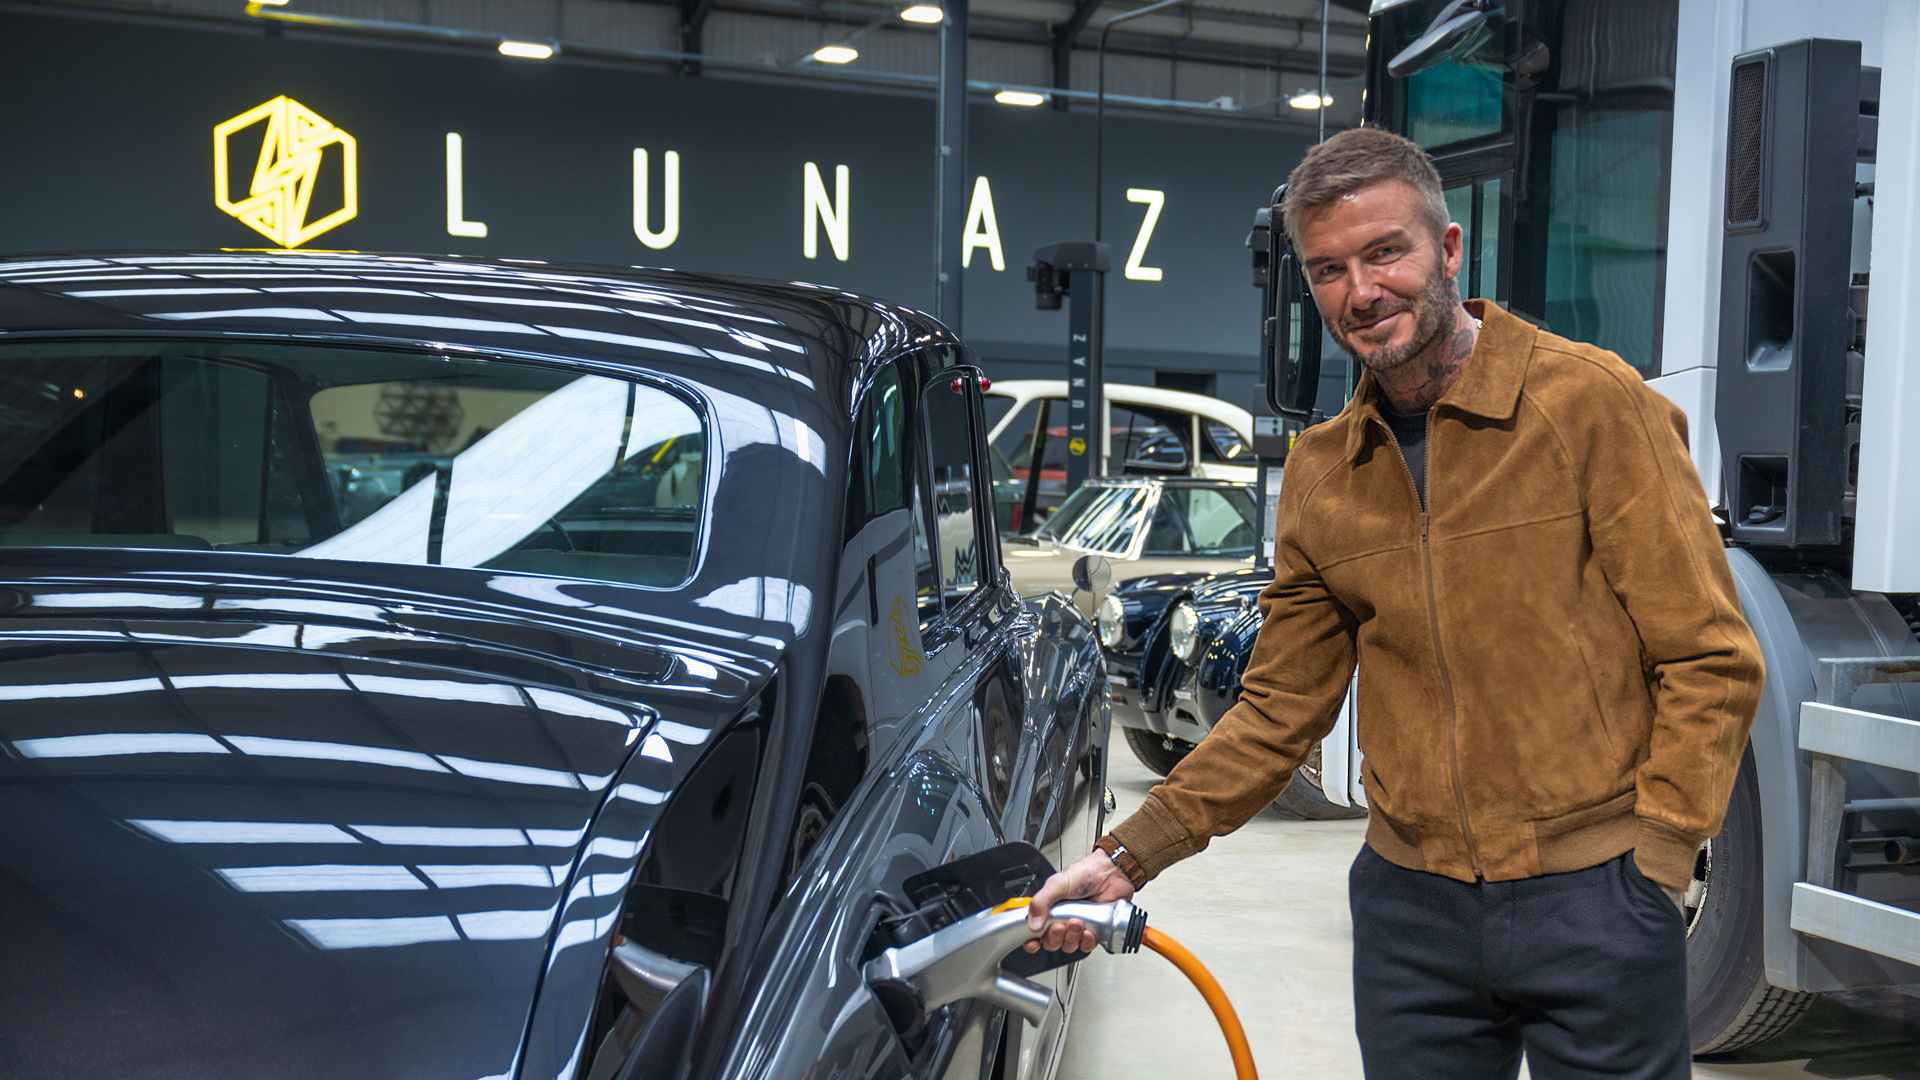 David Beckham at Lunaz's headquarters in Silverstone, United Kingdom